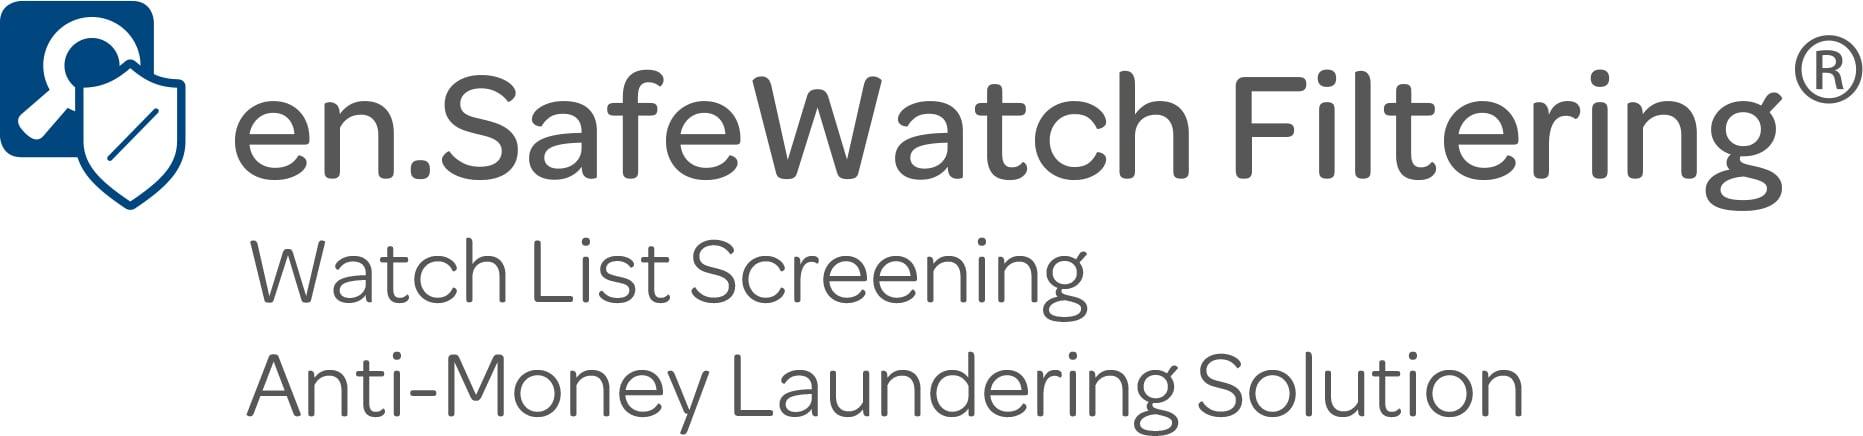 https://www.swift.com/about-us/partner-programme/swift-certified-applications/swift-certified-applications-finder